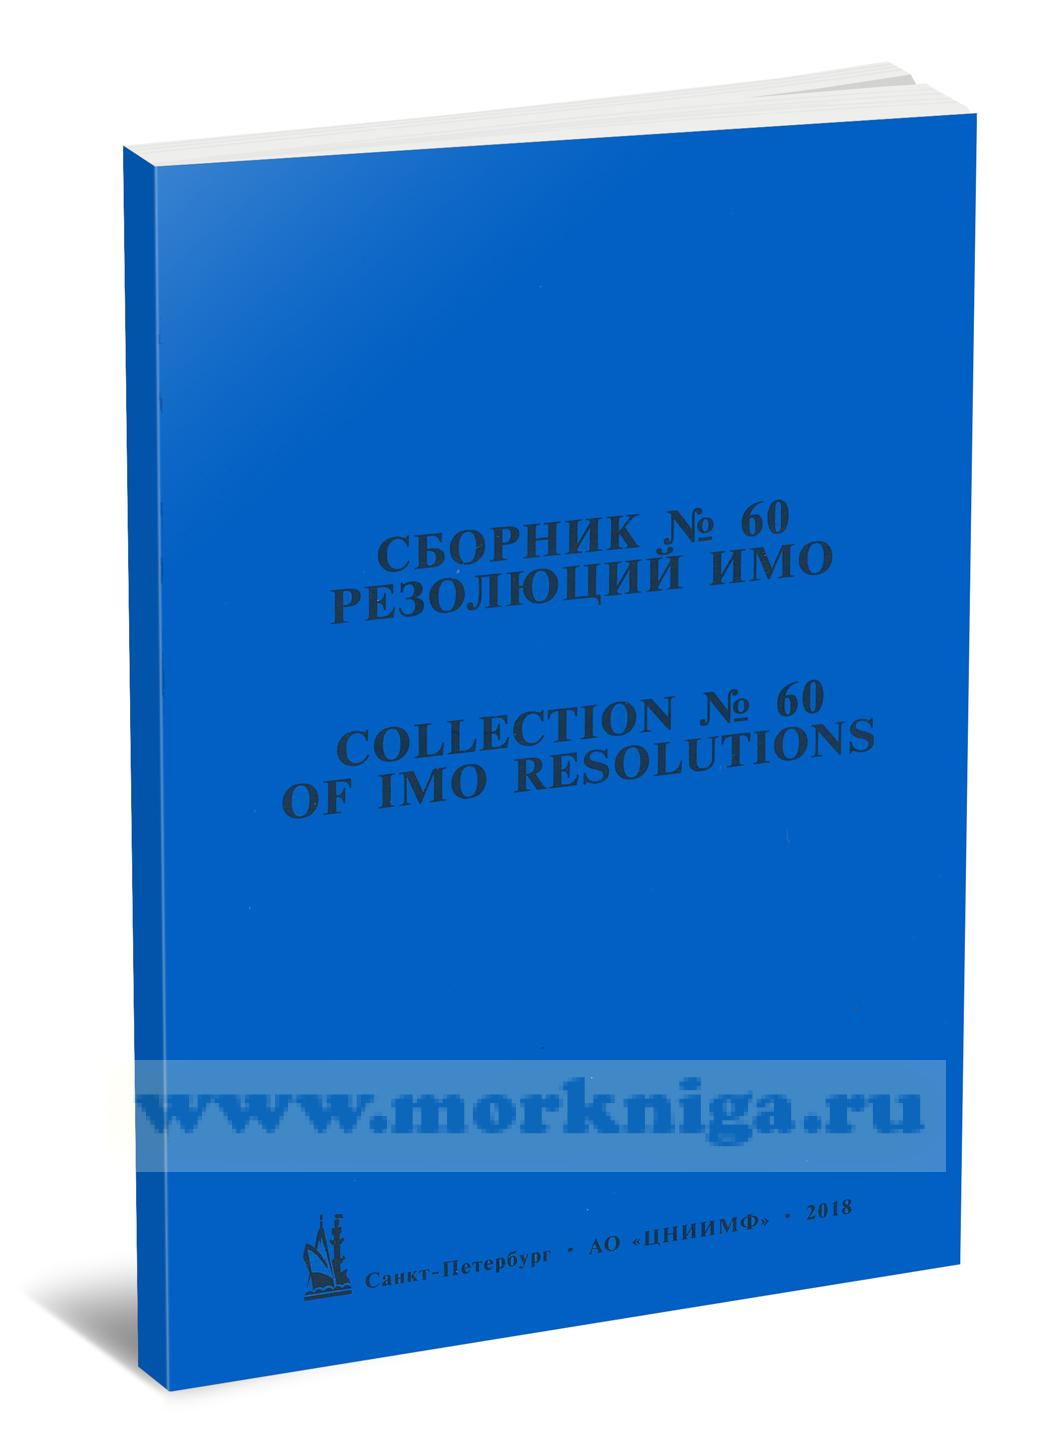 Сборник № 60 резолюций ИМО/ Collection No.60 of IMO Resolutions